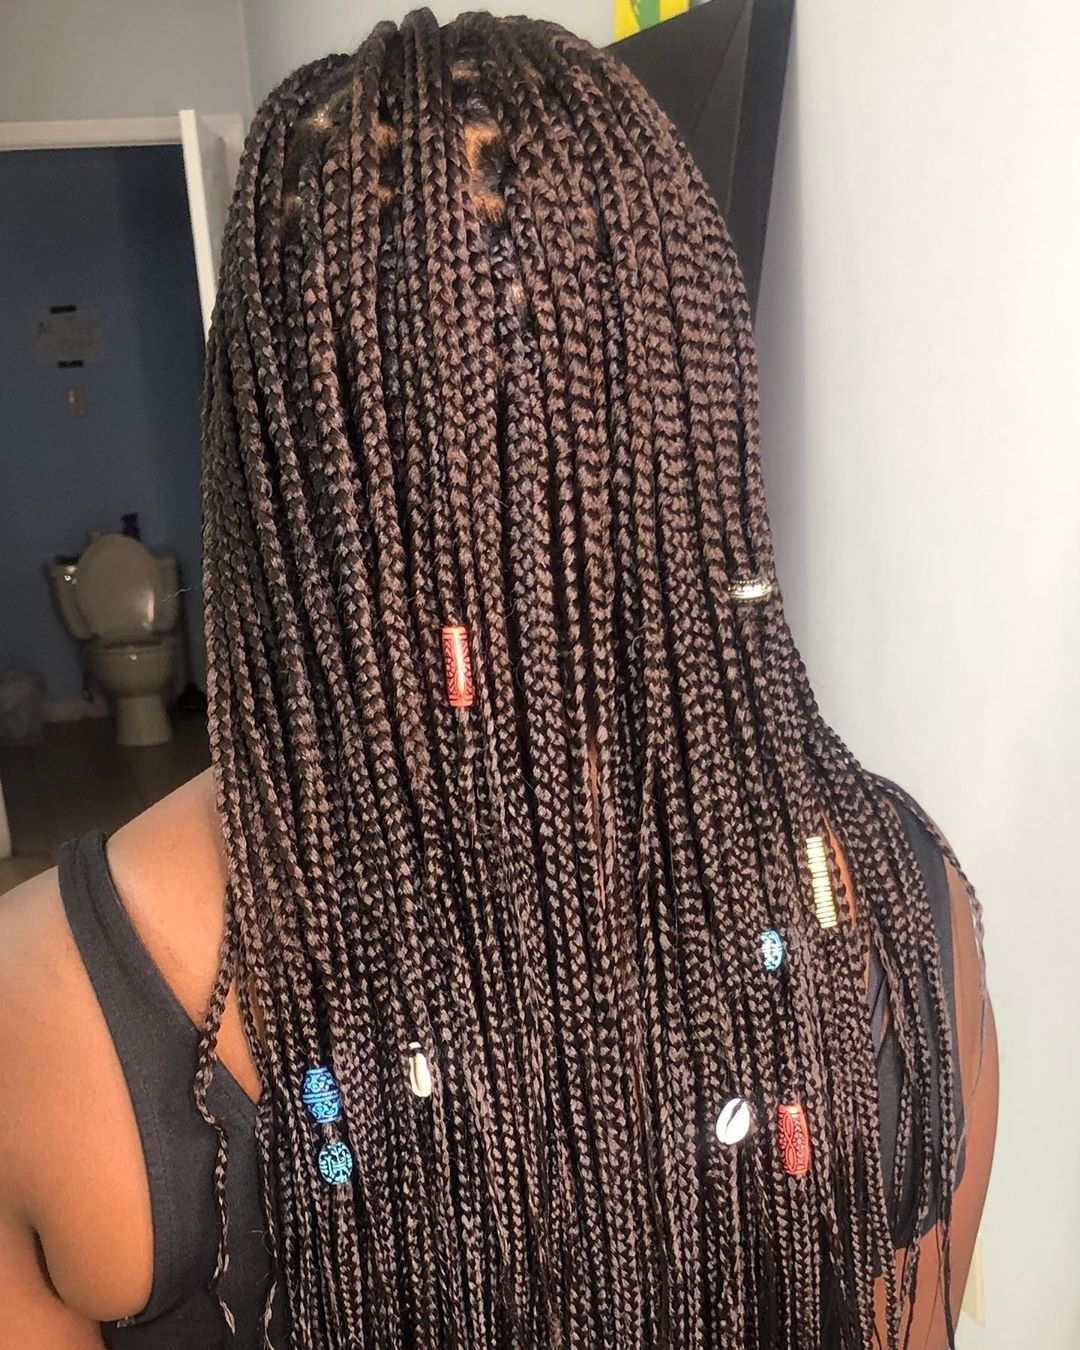 Goddess Tribal braids (half cornrows/half braids)  . . . #feedinbraids #cornrows #cornrowstyles #feedinbraidsatlanta #feedinbraidslondon #goddessbraids #goddessboxbraids #goddessfeedinbraids #braids #neatbraids #braidsatlanta #tribal Braids half up half down